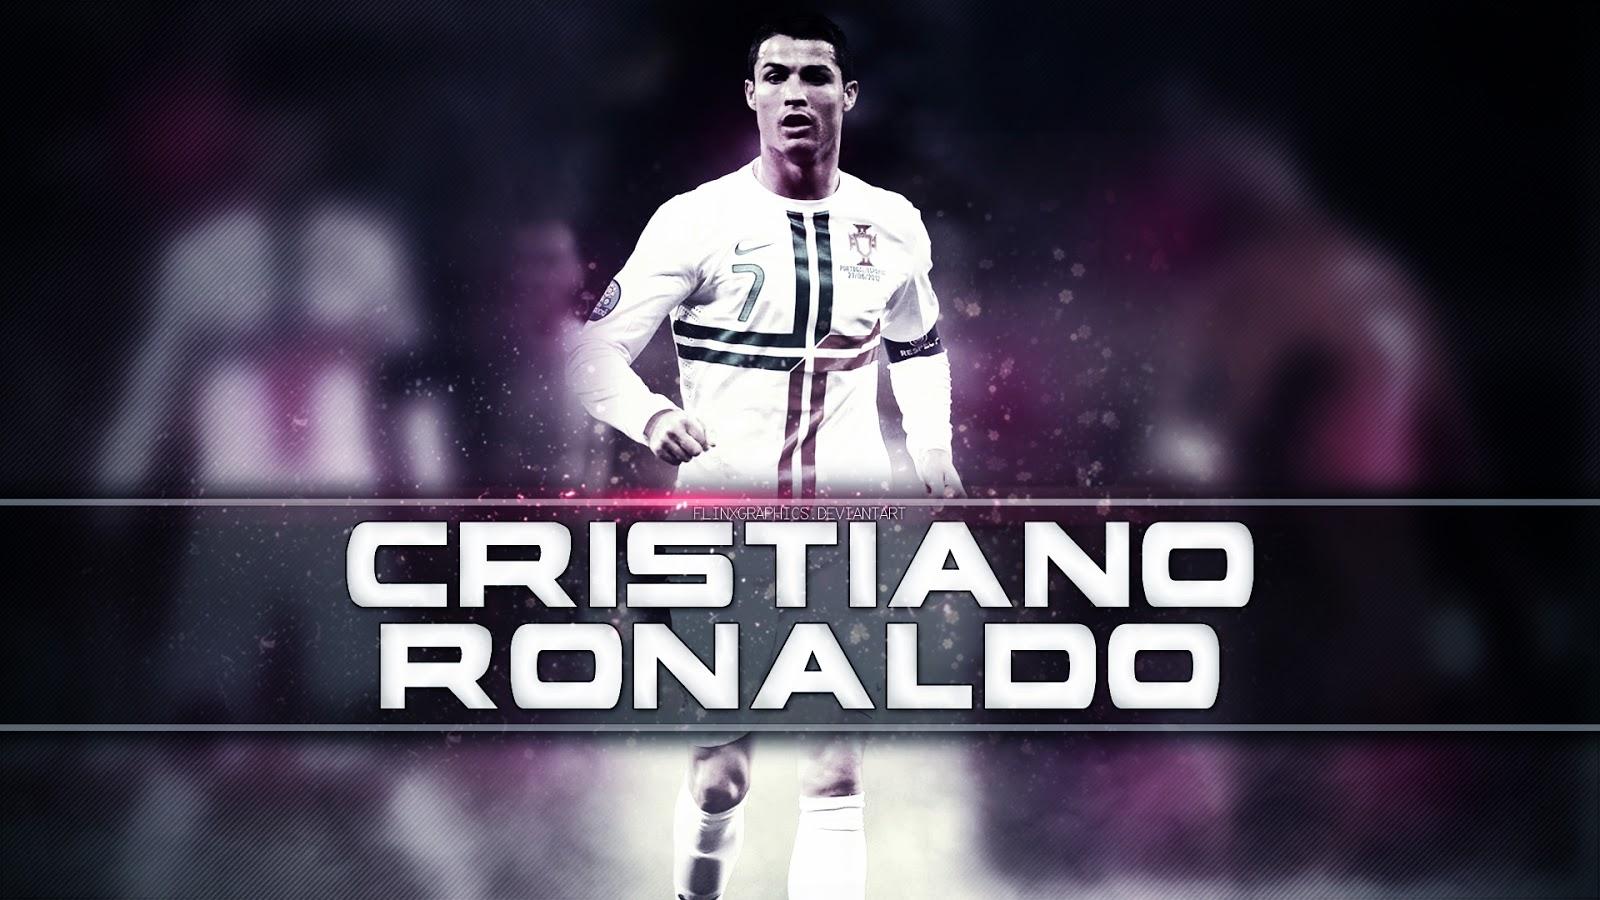 Cristiano Ronaldo New HD Wallpapers 2014 2015 Football Wallpapers HD 1600x900